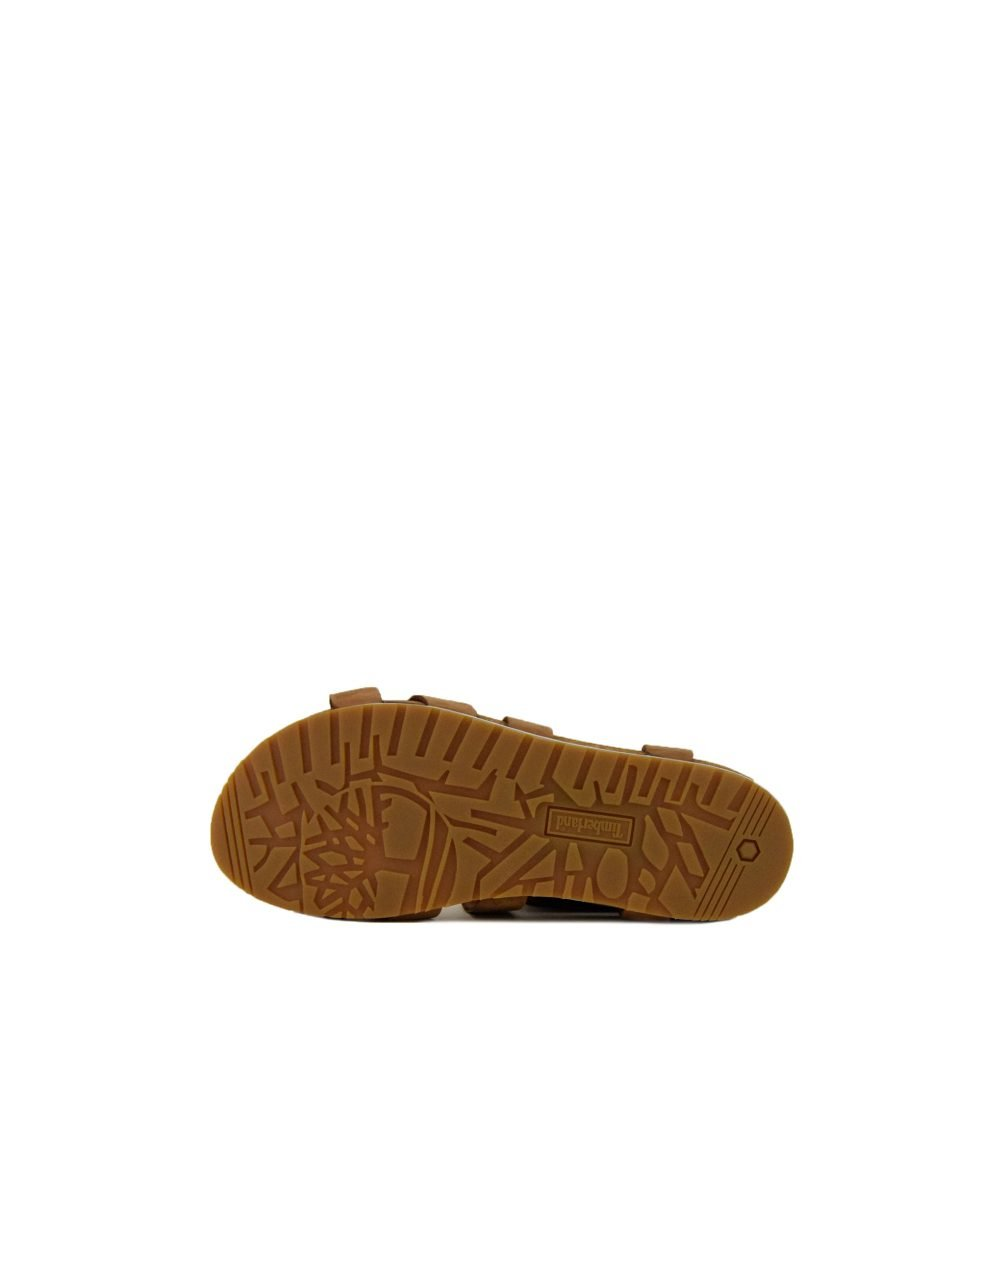 Timberland Malibu Waves Ankle (TB0A1MQR-F13) Rust Nubuck